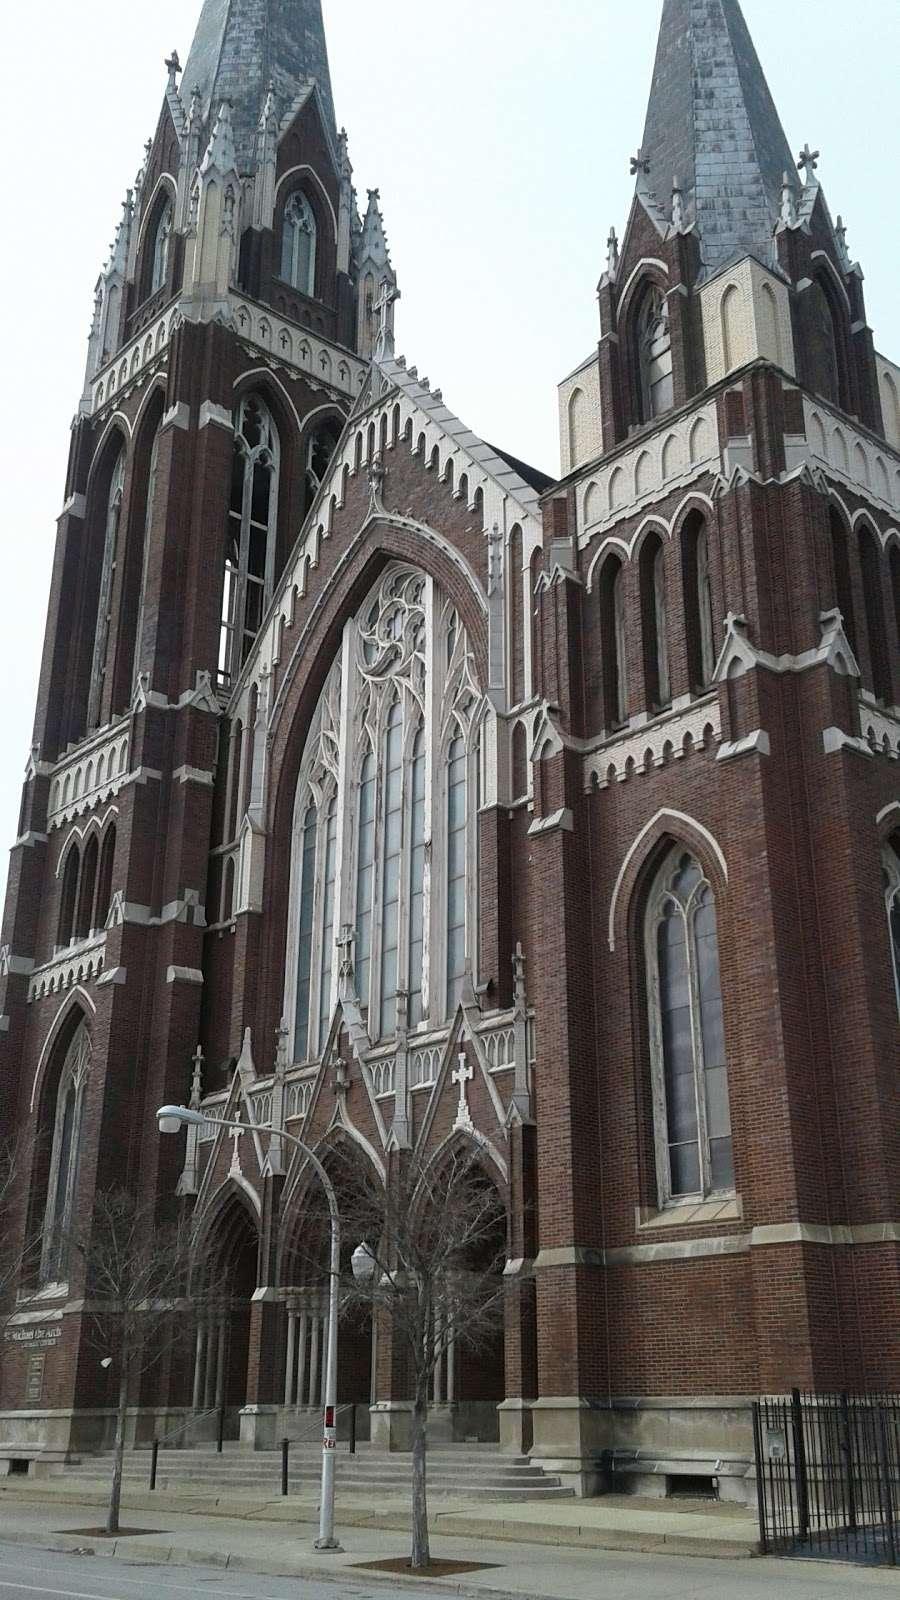 St. Michael the Archangel Roman Catholic Church - church  | Photo 10 of 10 | Address: 8237 S South Shore Dr, Chicago, IL 60617, USA | Phone: (773) 734-4921